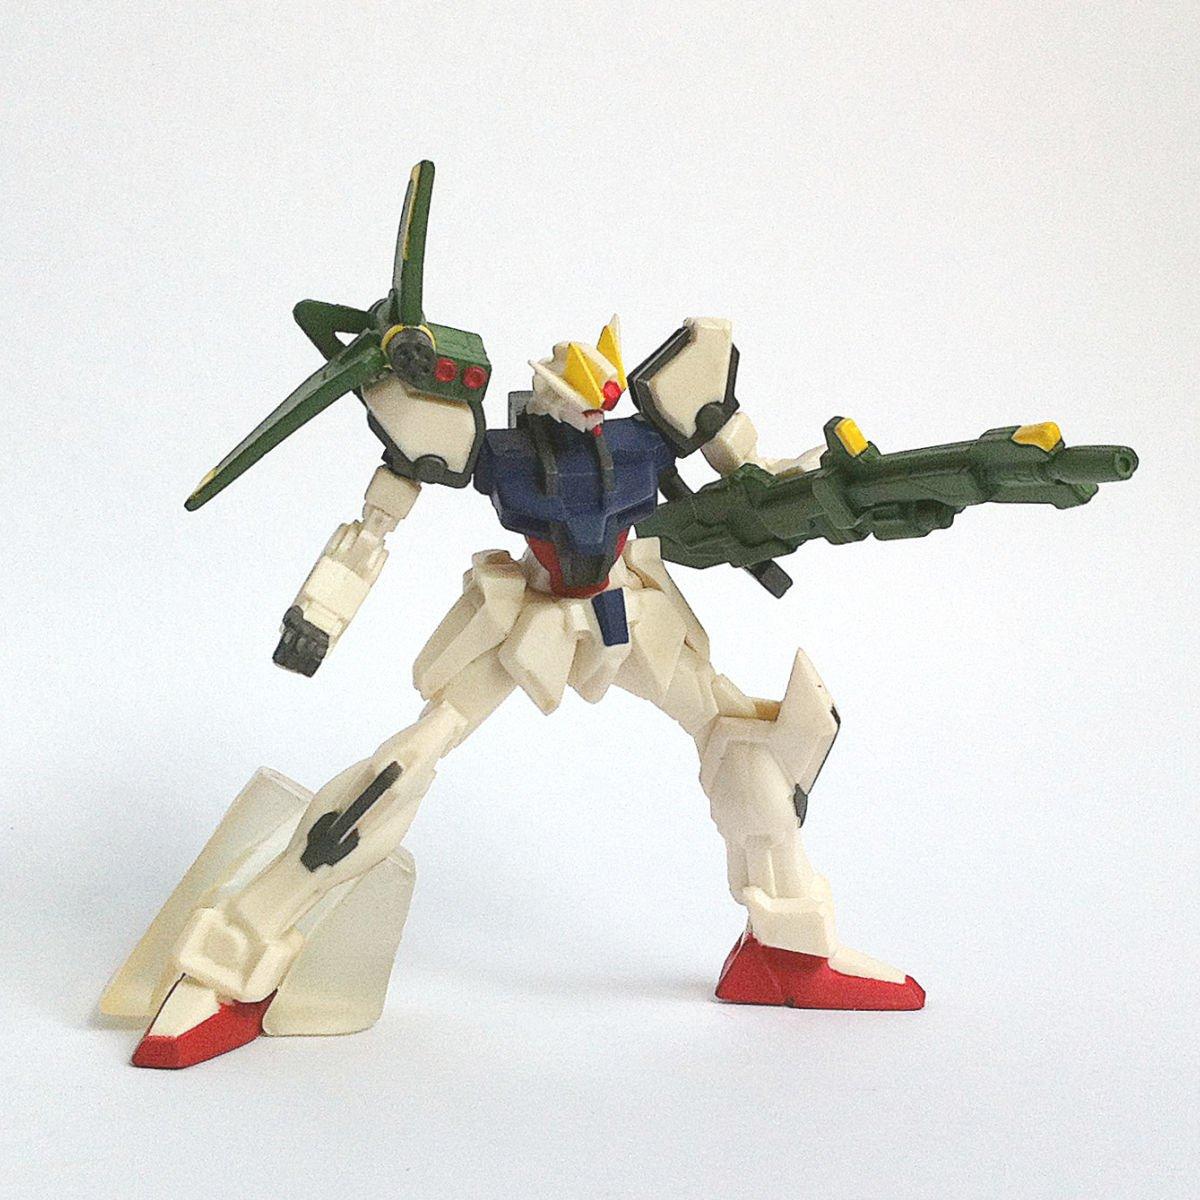 GAT-X105+AQM/E-X03 Launcher Strike Gundam from HG Gundam MS Selection by Bandai